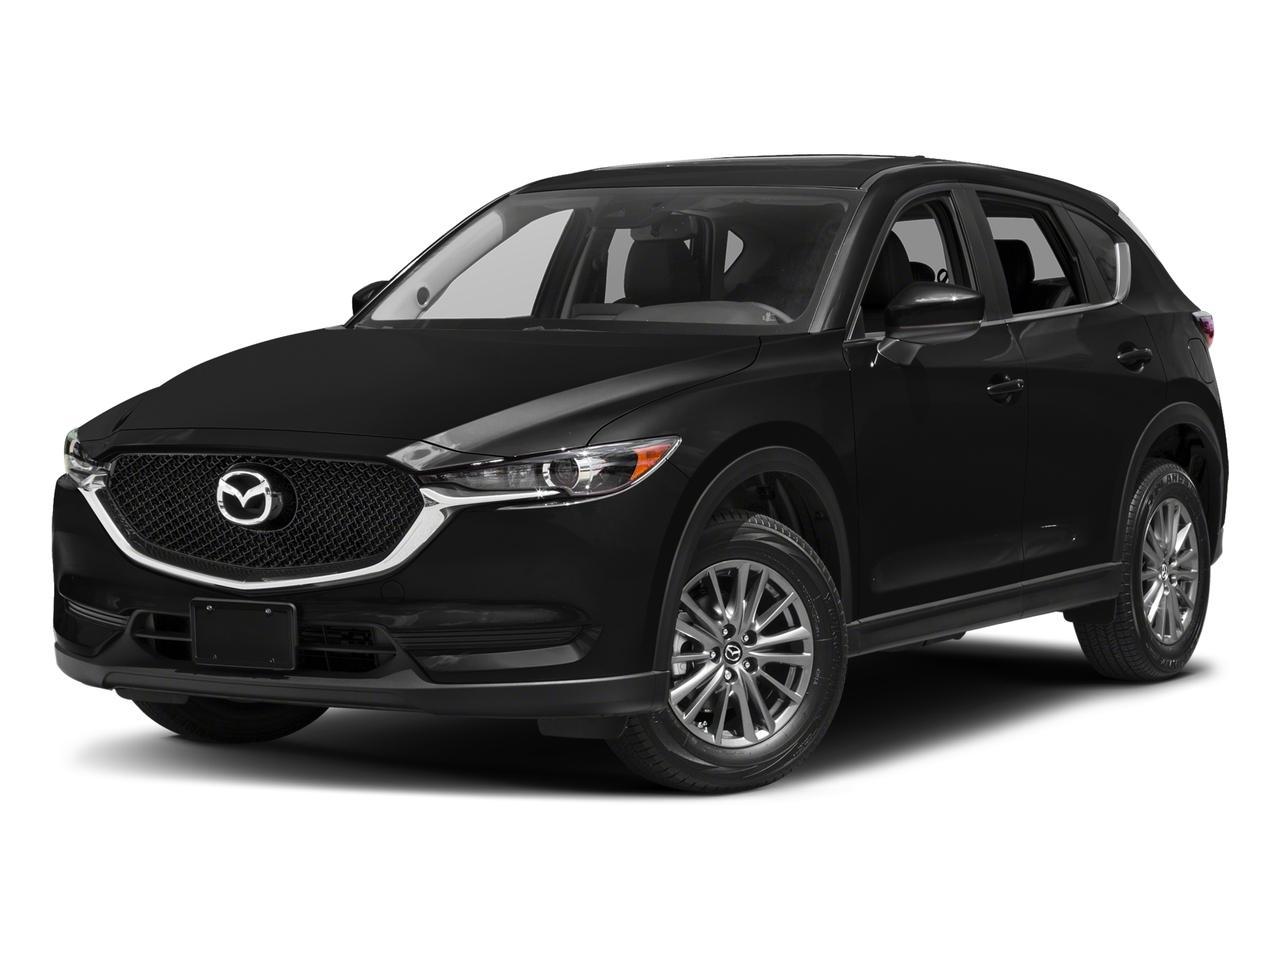 2017 Mazda CX-5 Vehicle Photo in Joliet, IL 60586